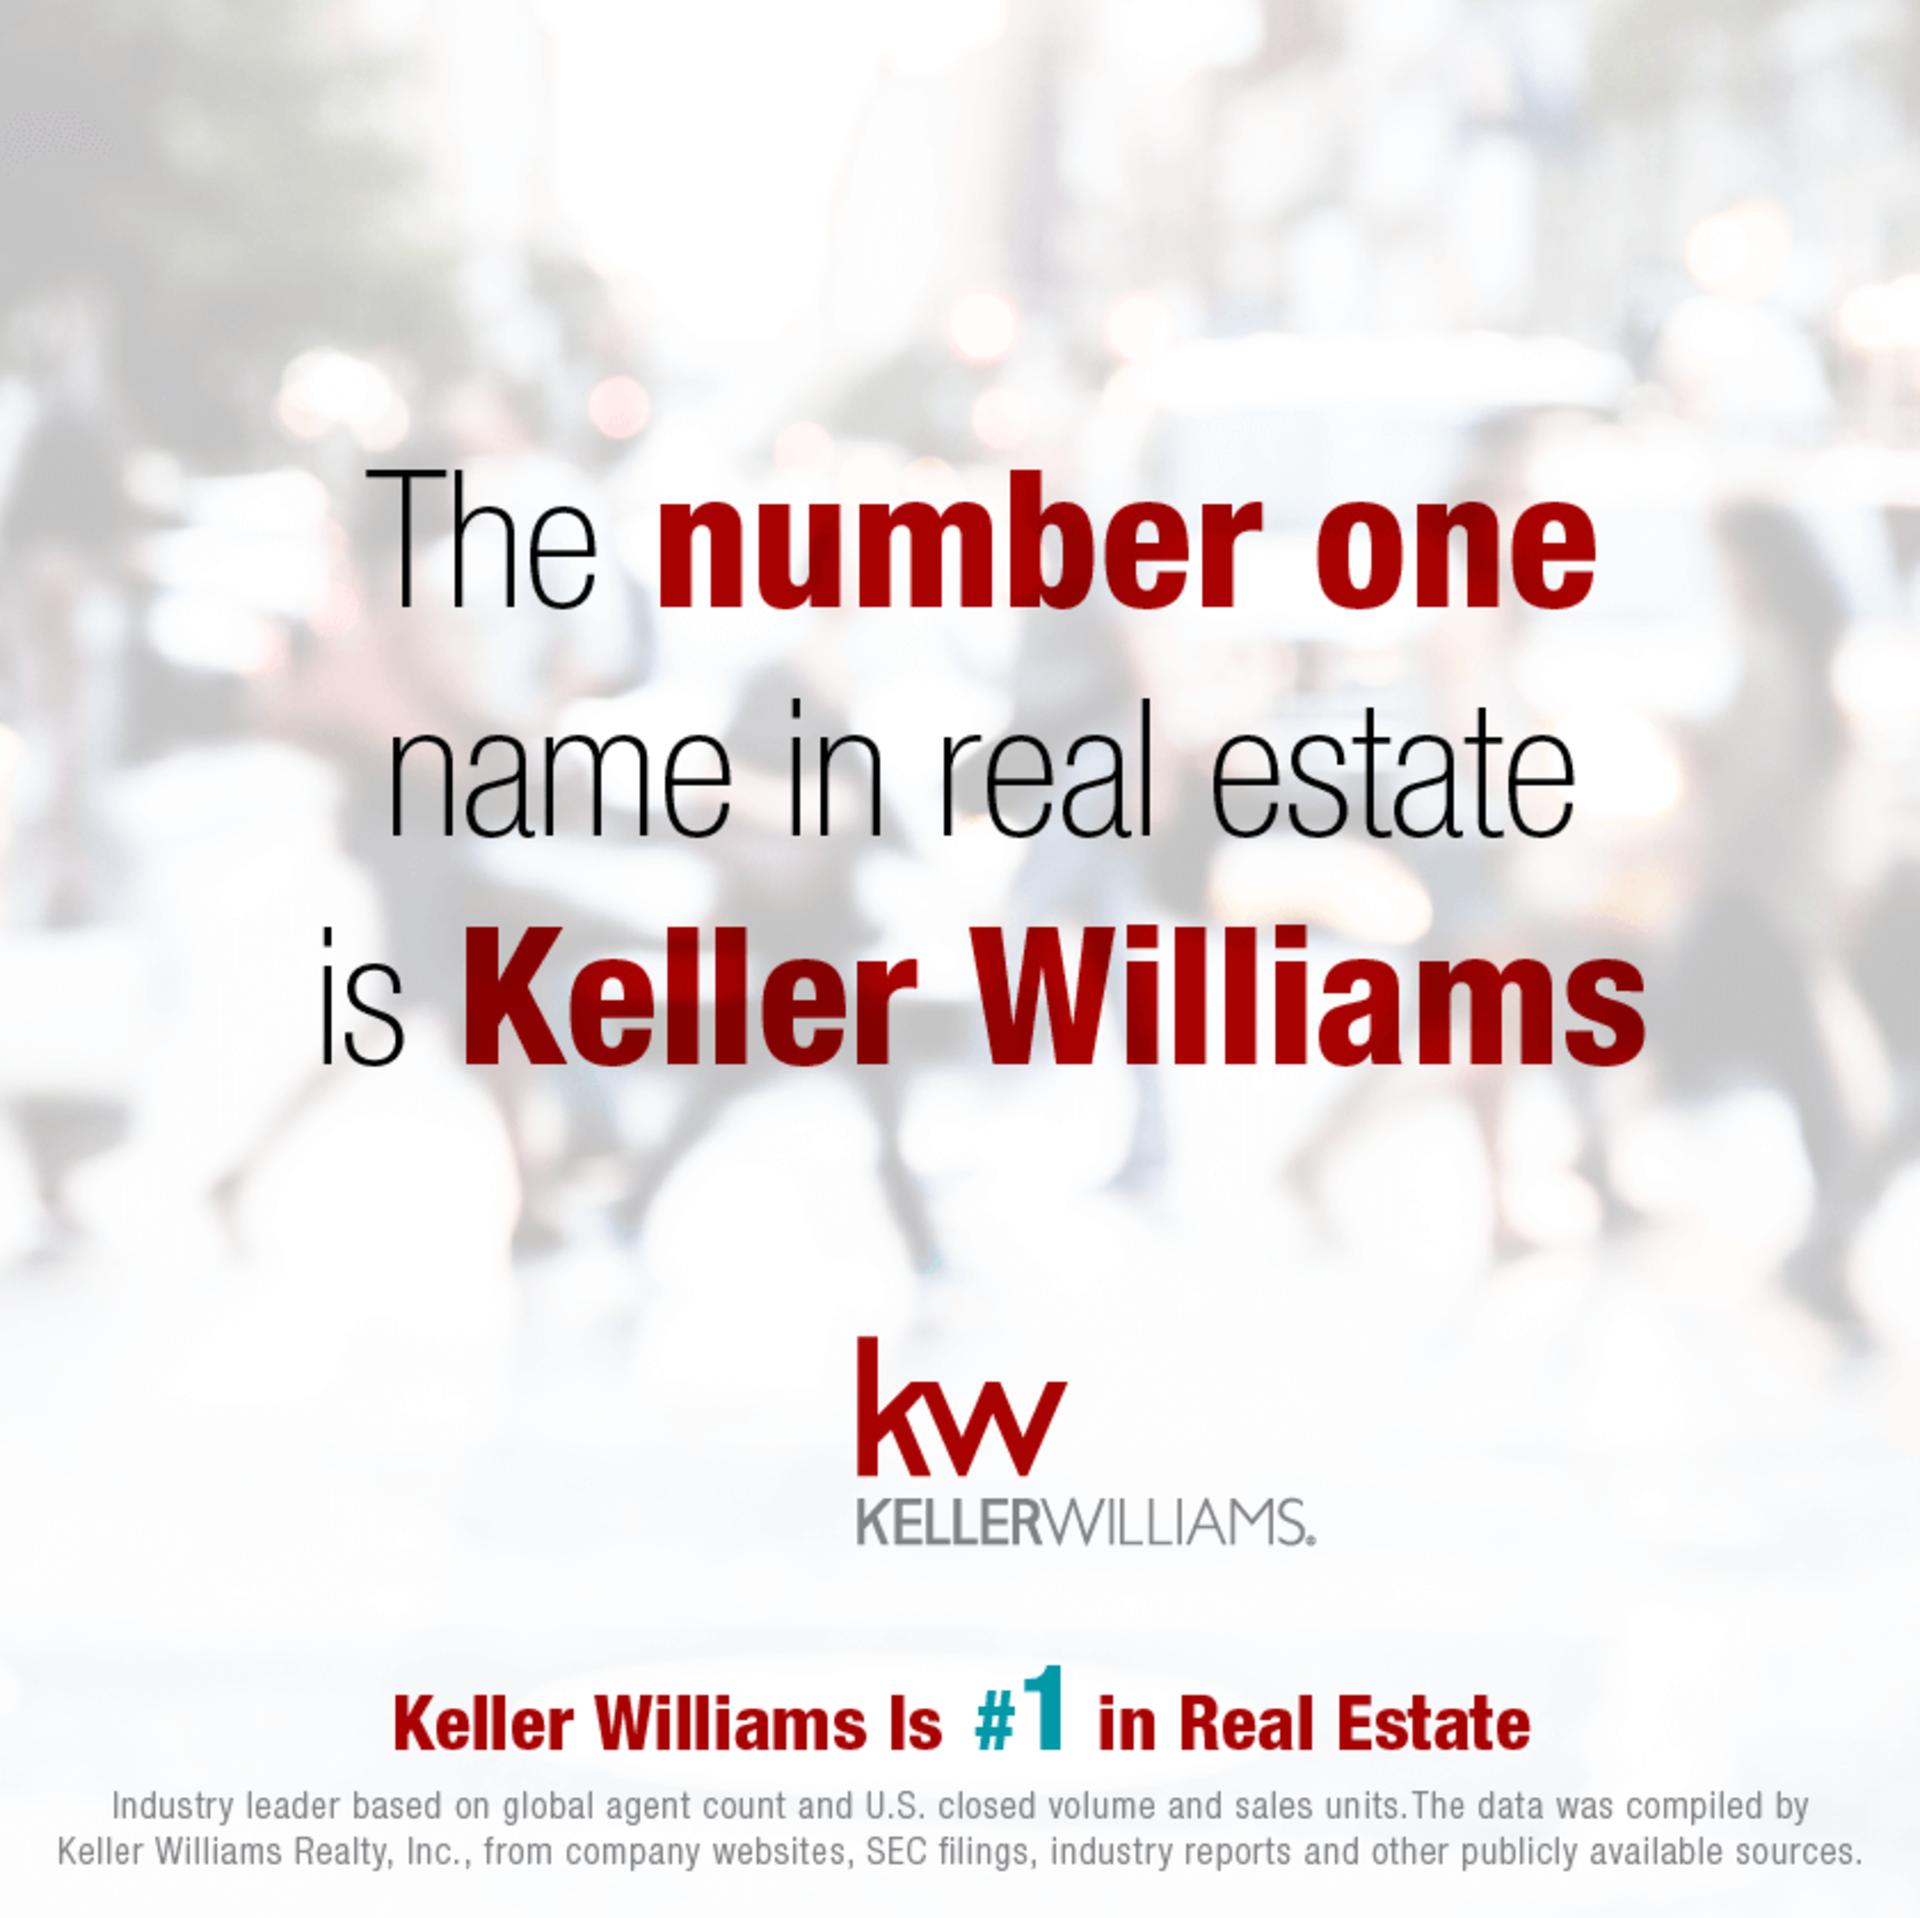 Keller Williams #1 in Real Estate!